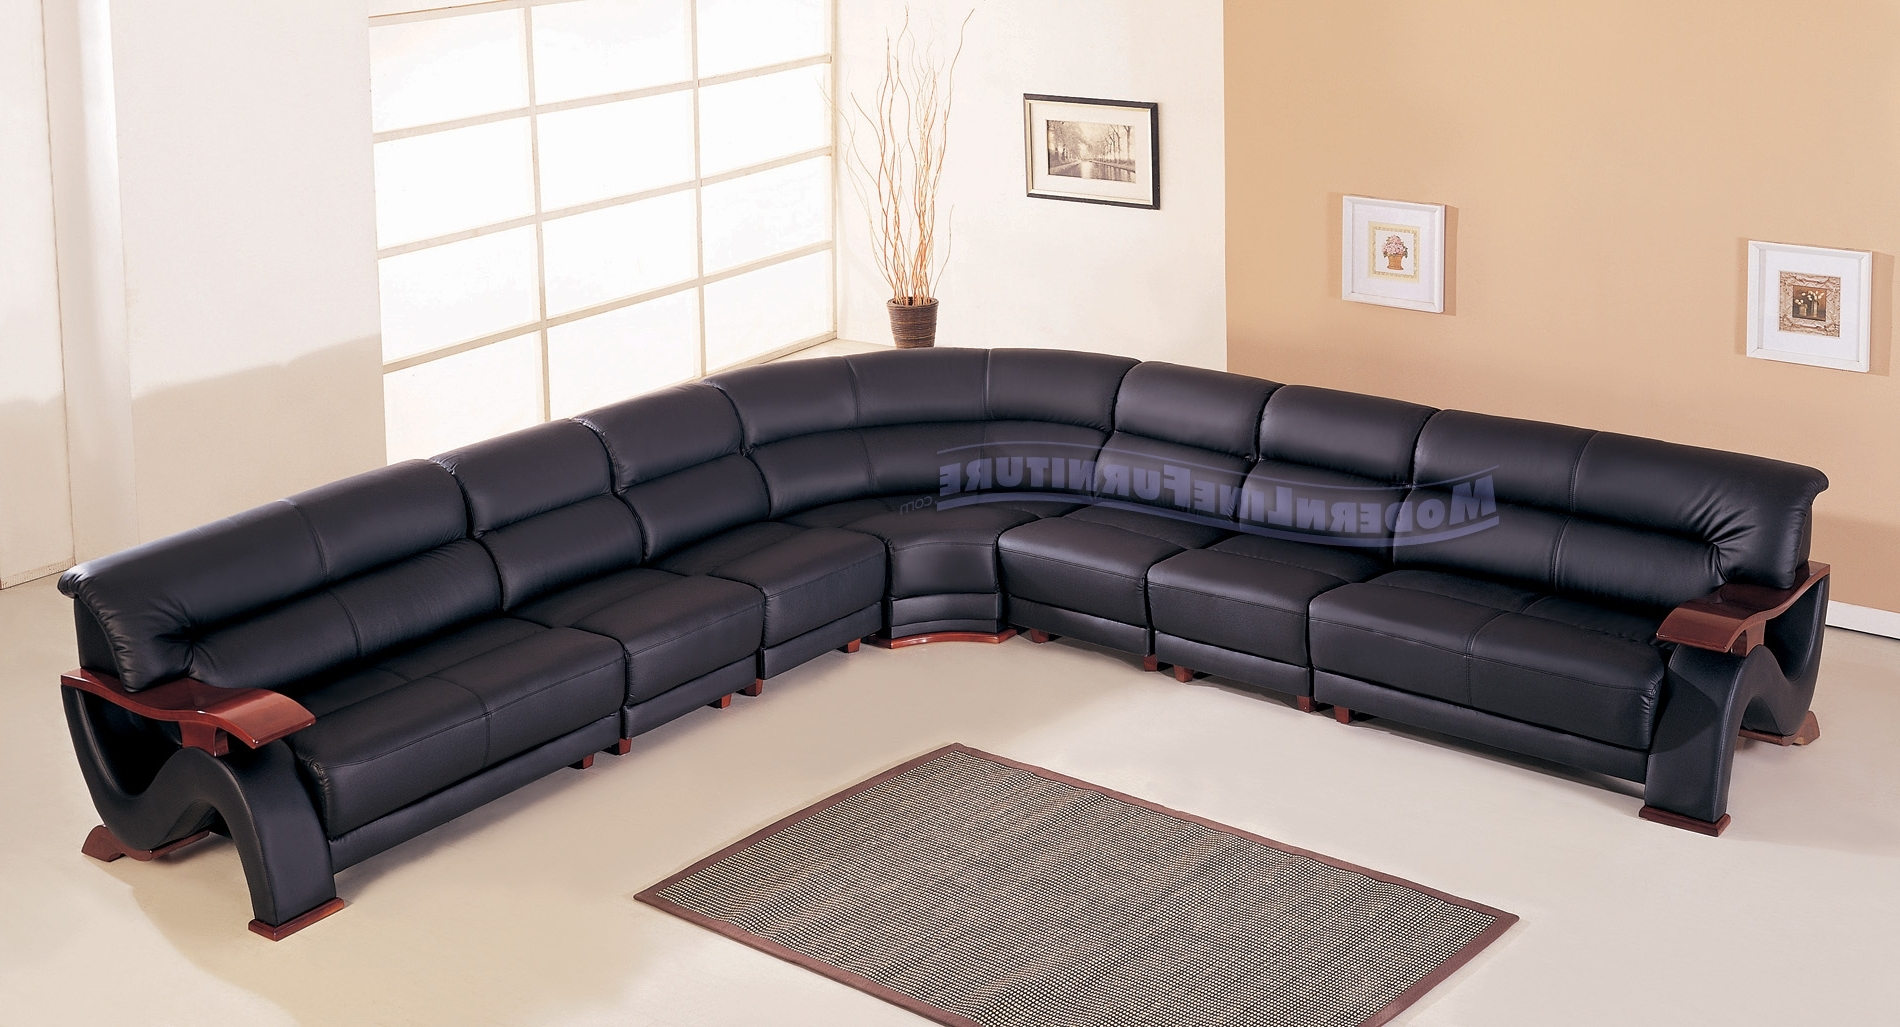 2018 Sectional Sofa Design: Amazing Extra Long Sectional Sofa Extra For Okc Sectional Sofas (View 2 of 15)